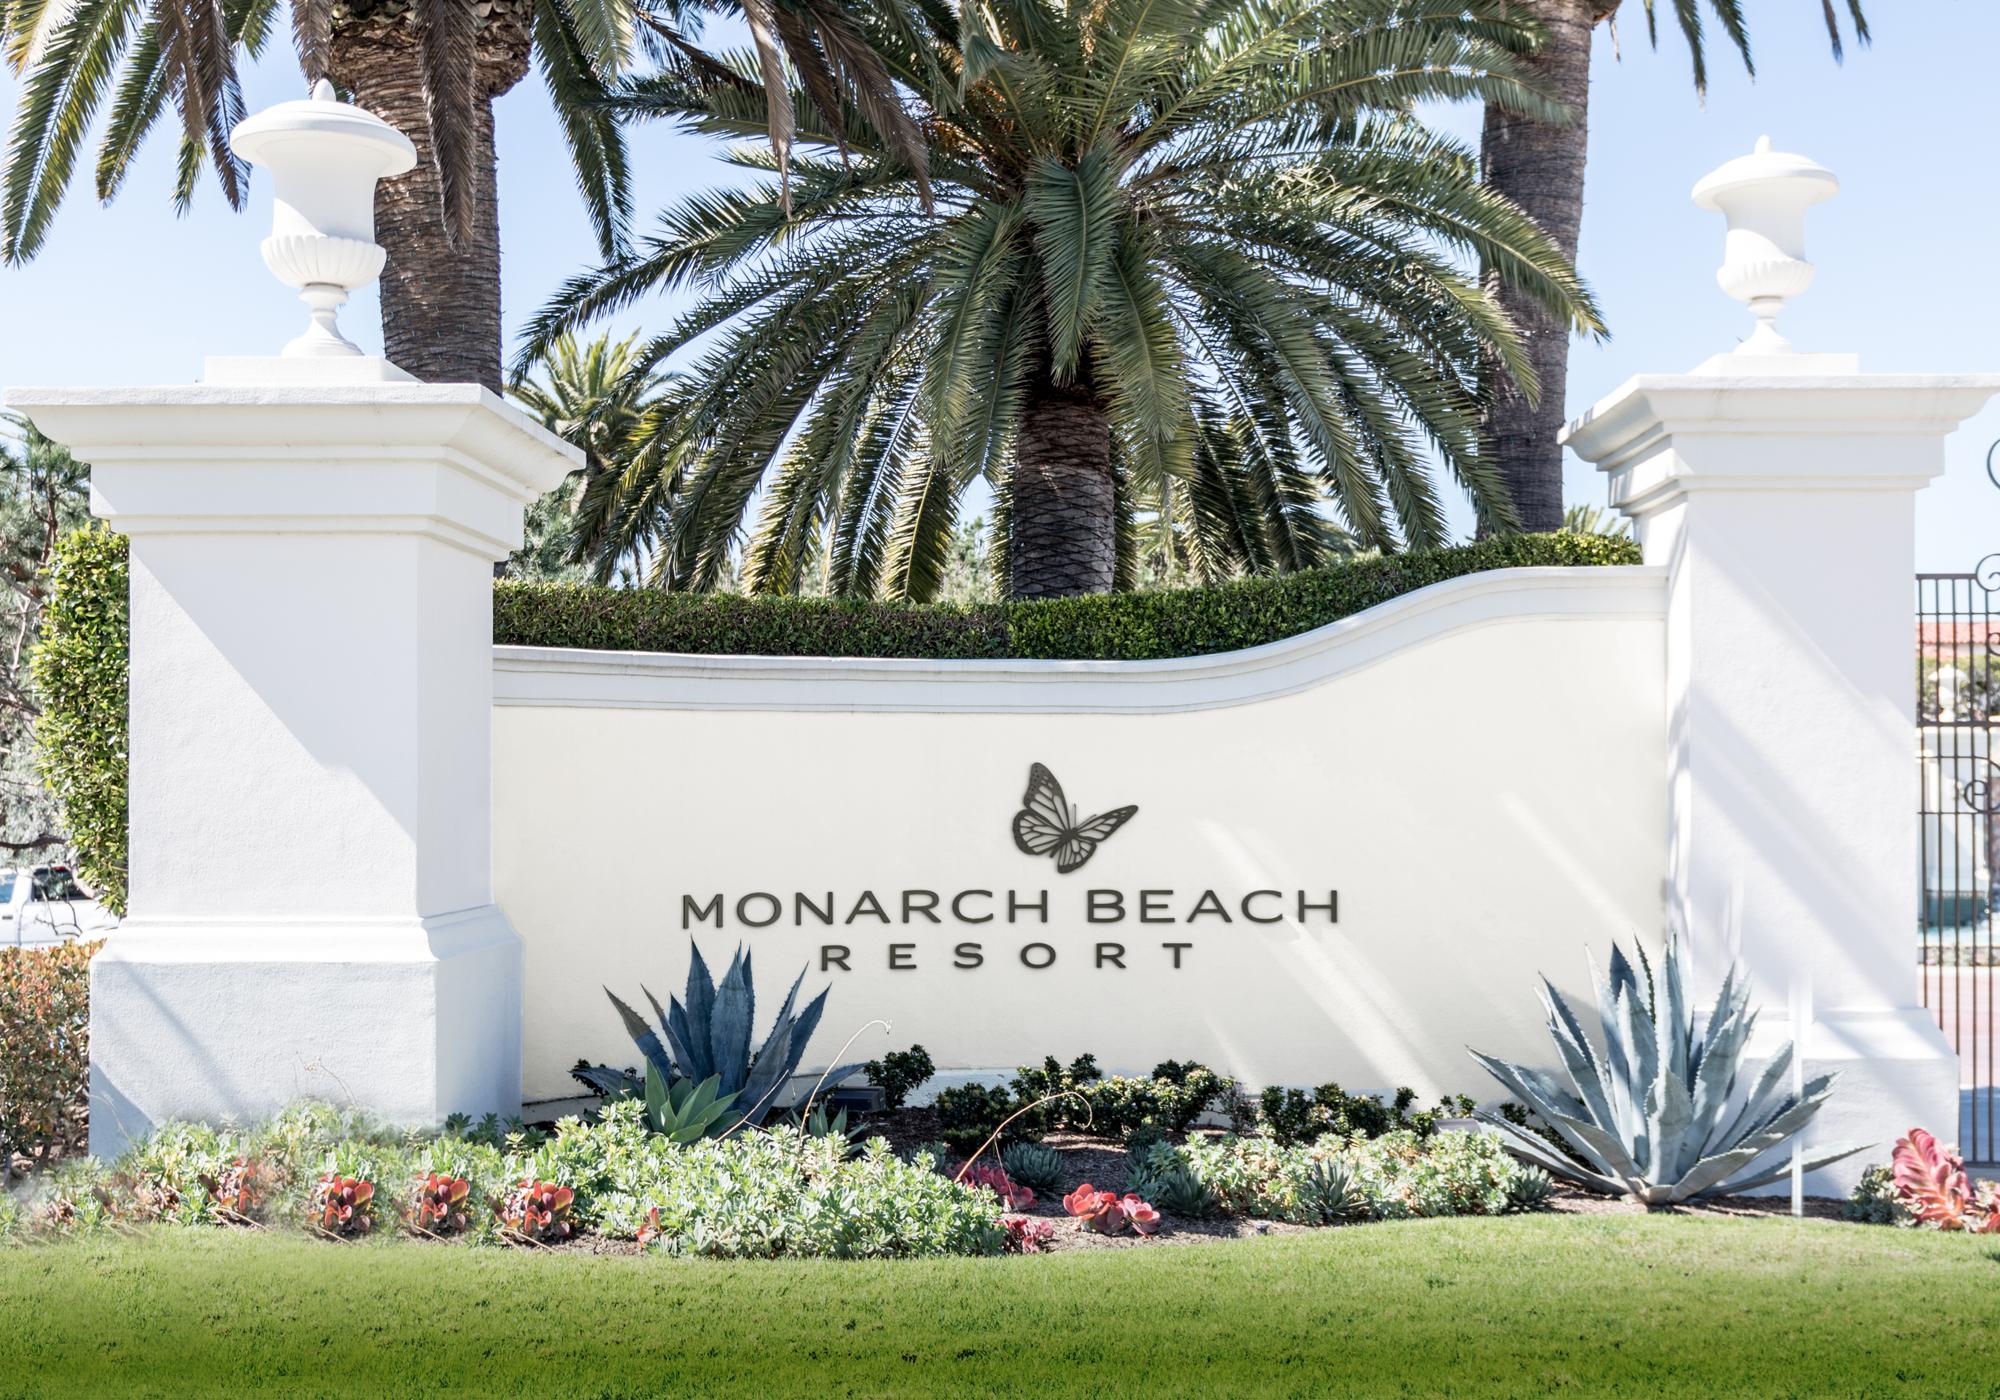 altitude-design-office-monarch-beach-entrance.jpg